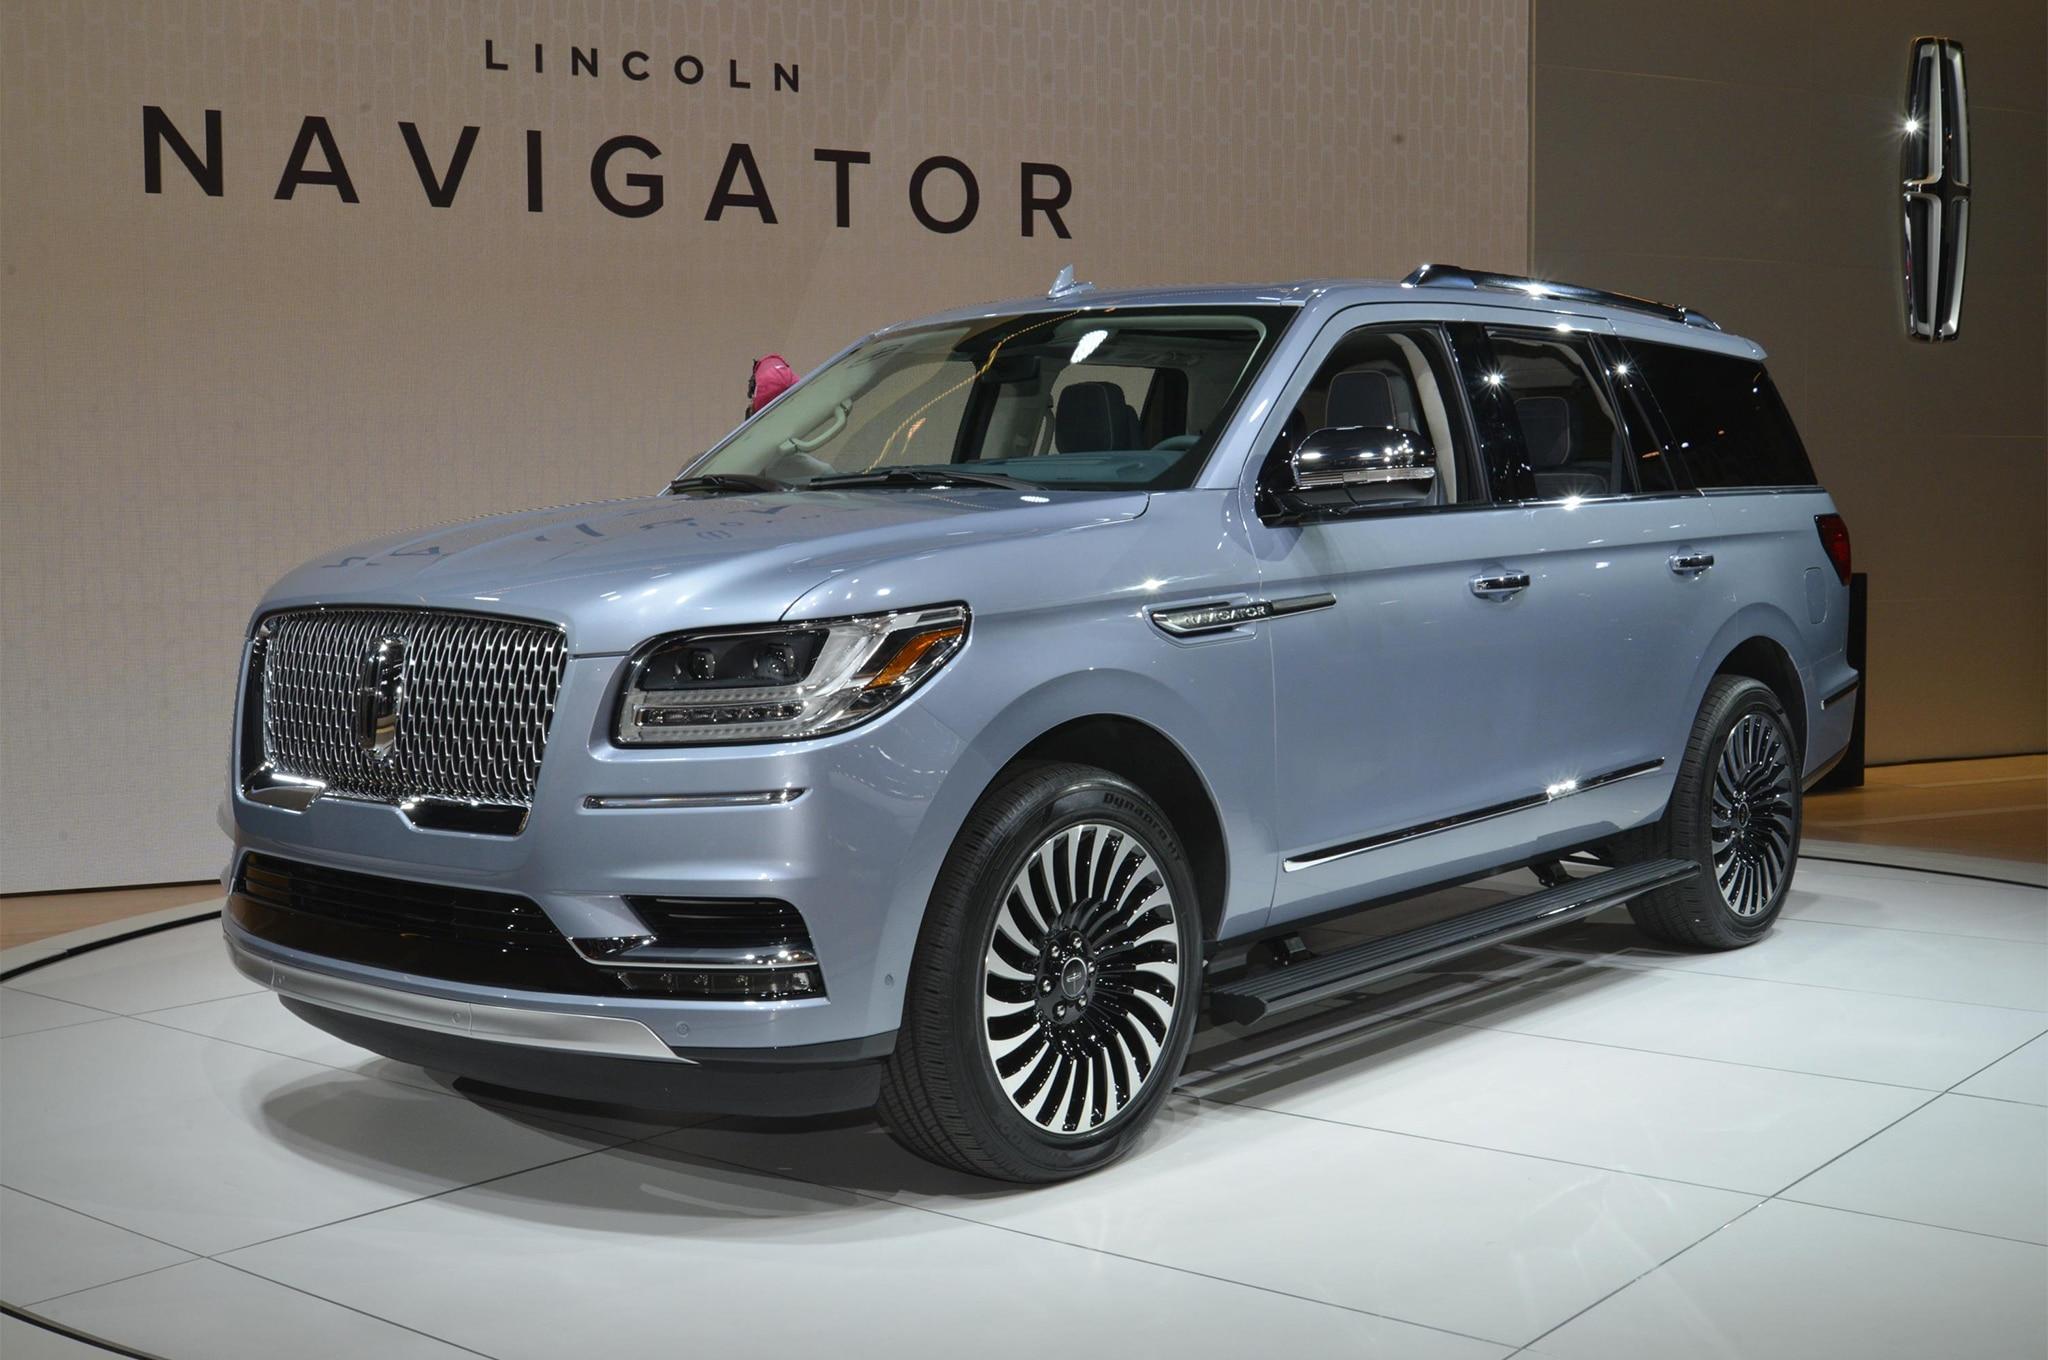 2018 Lincoln Navigator front three quarter 06